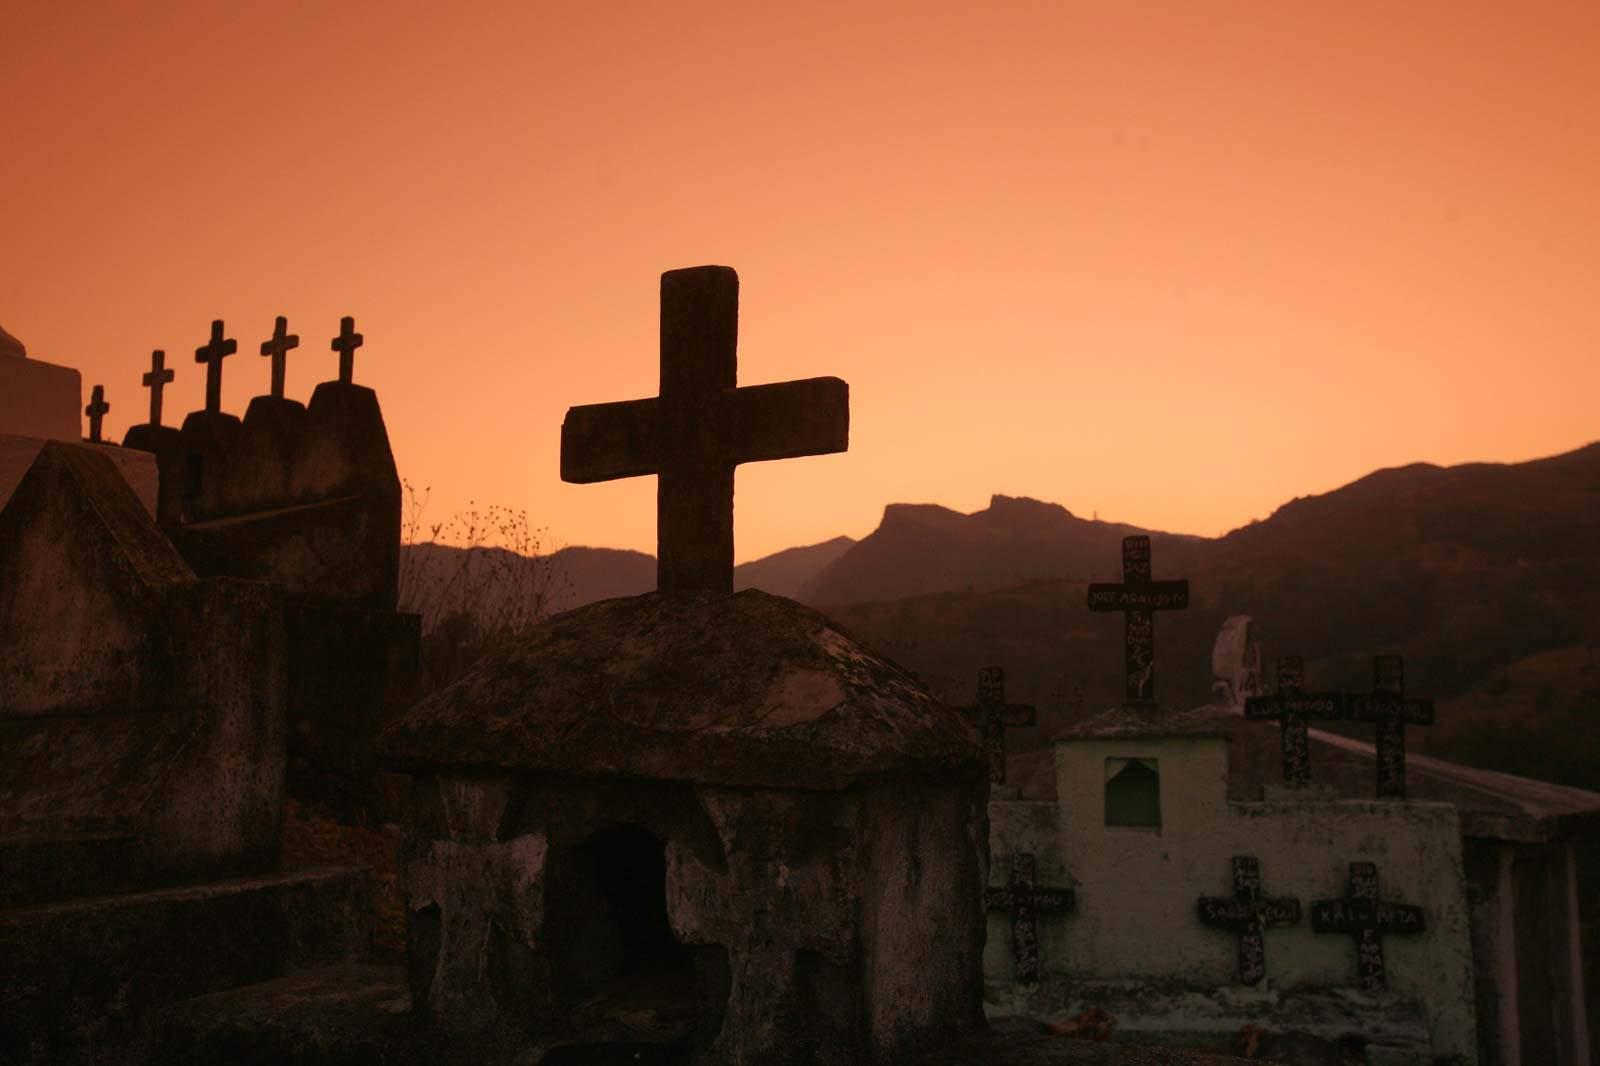 Cemitério em Maubisse, Timor-Leste